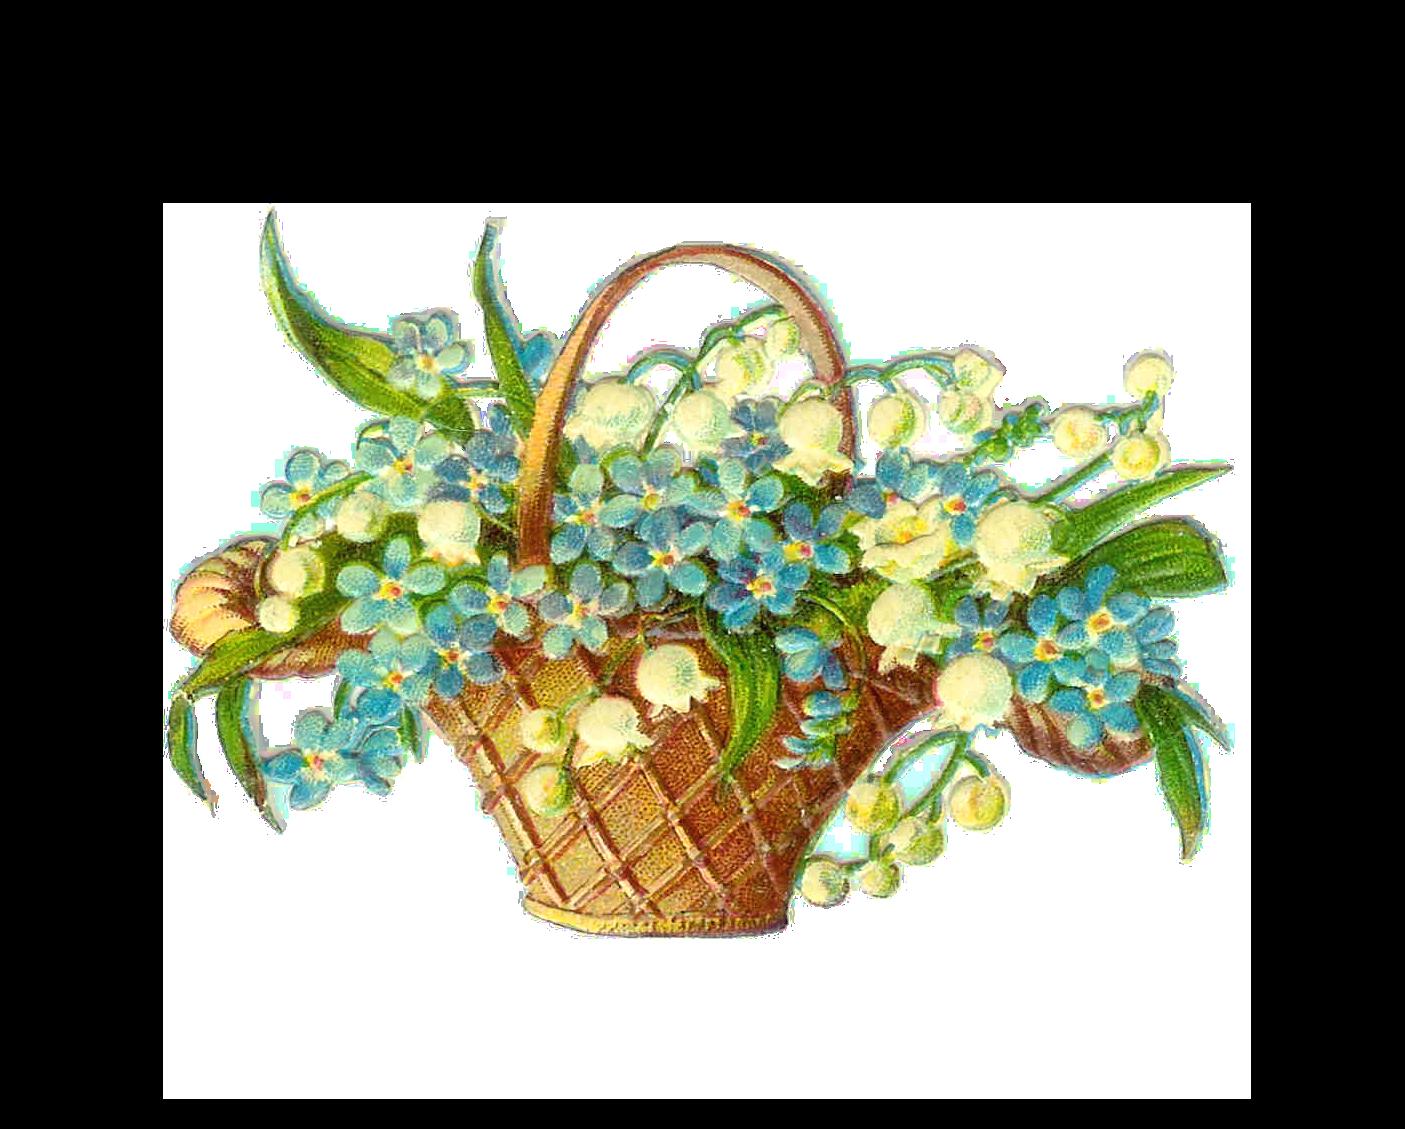 Clipart Flower Baskets : Flower basket clipart suggest